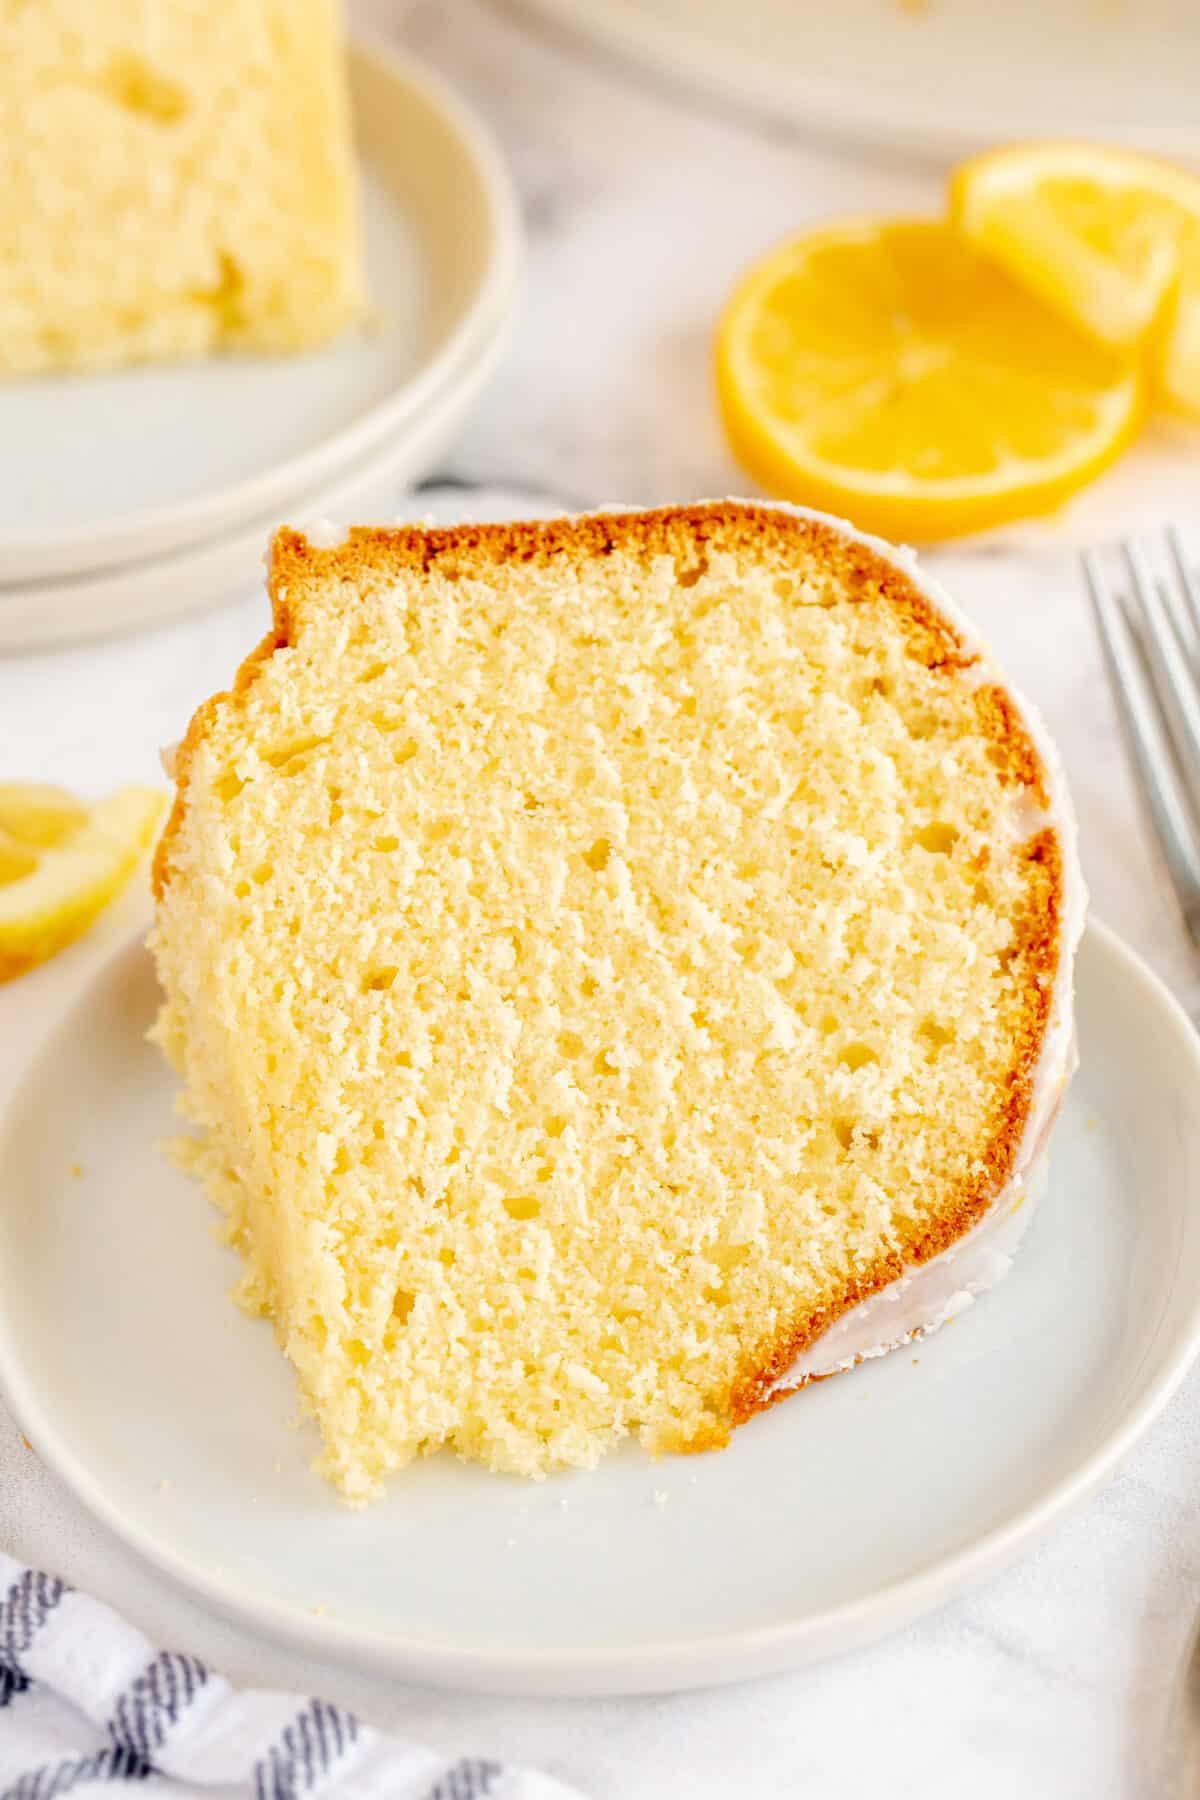 close up of a slice of lemon cake